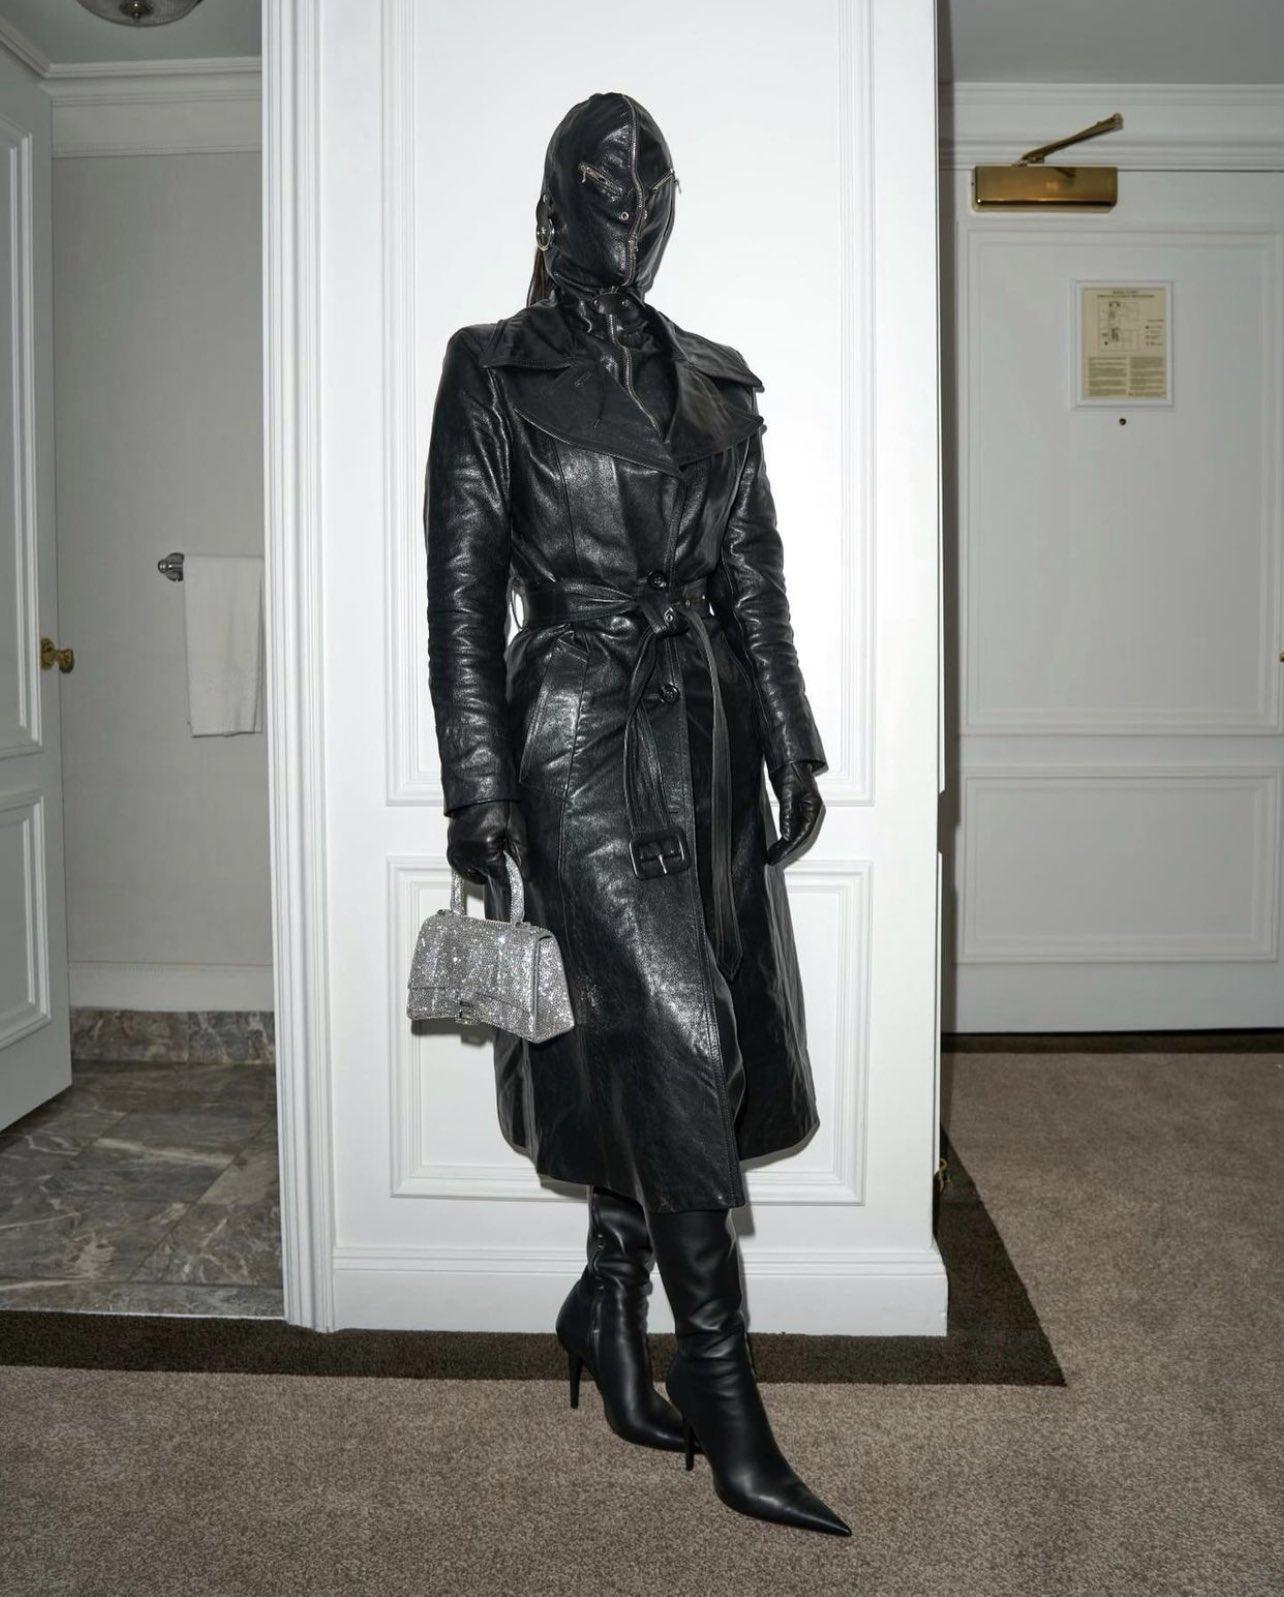 Kim Kardashian is kinky in fetish leather mask in NYC